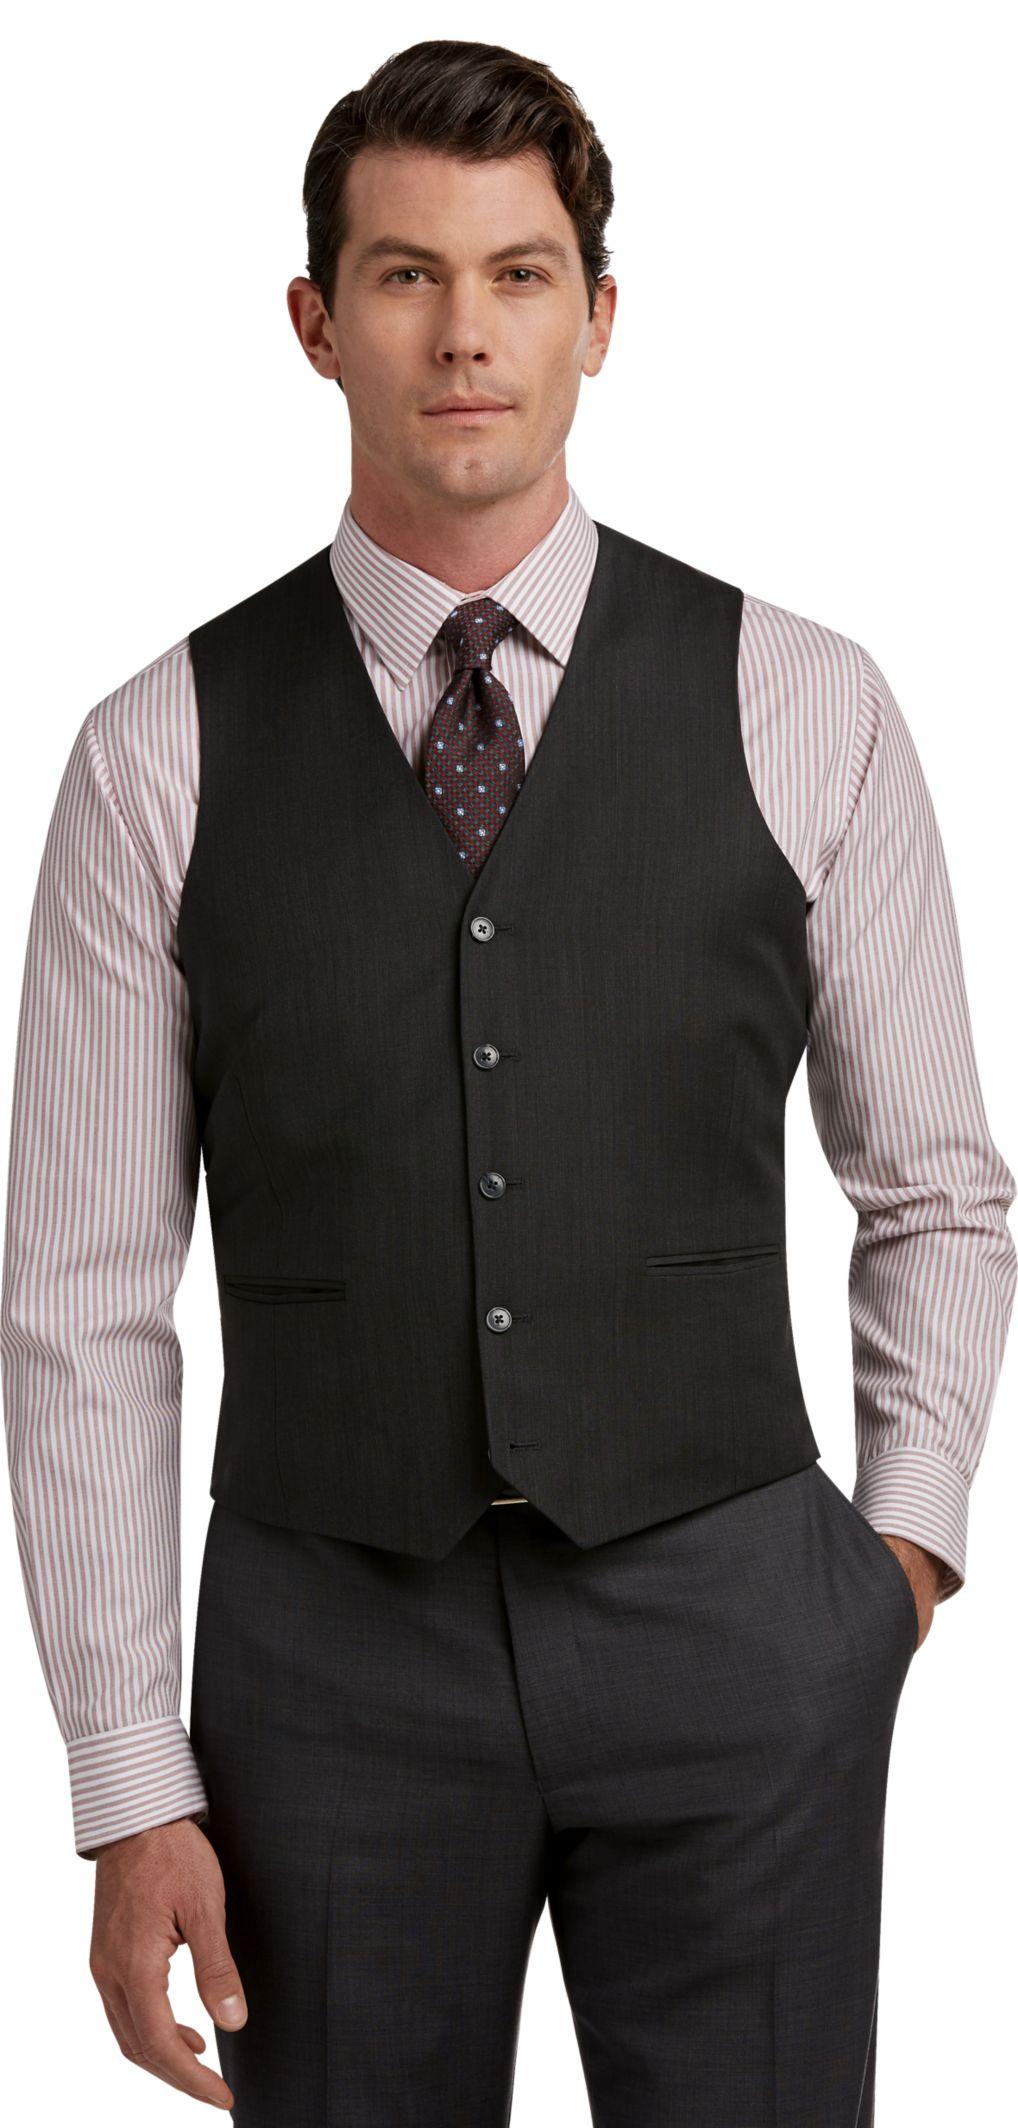 Black dress shirt grey jacket